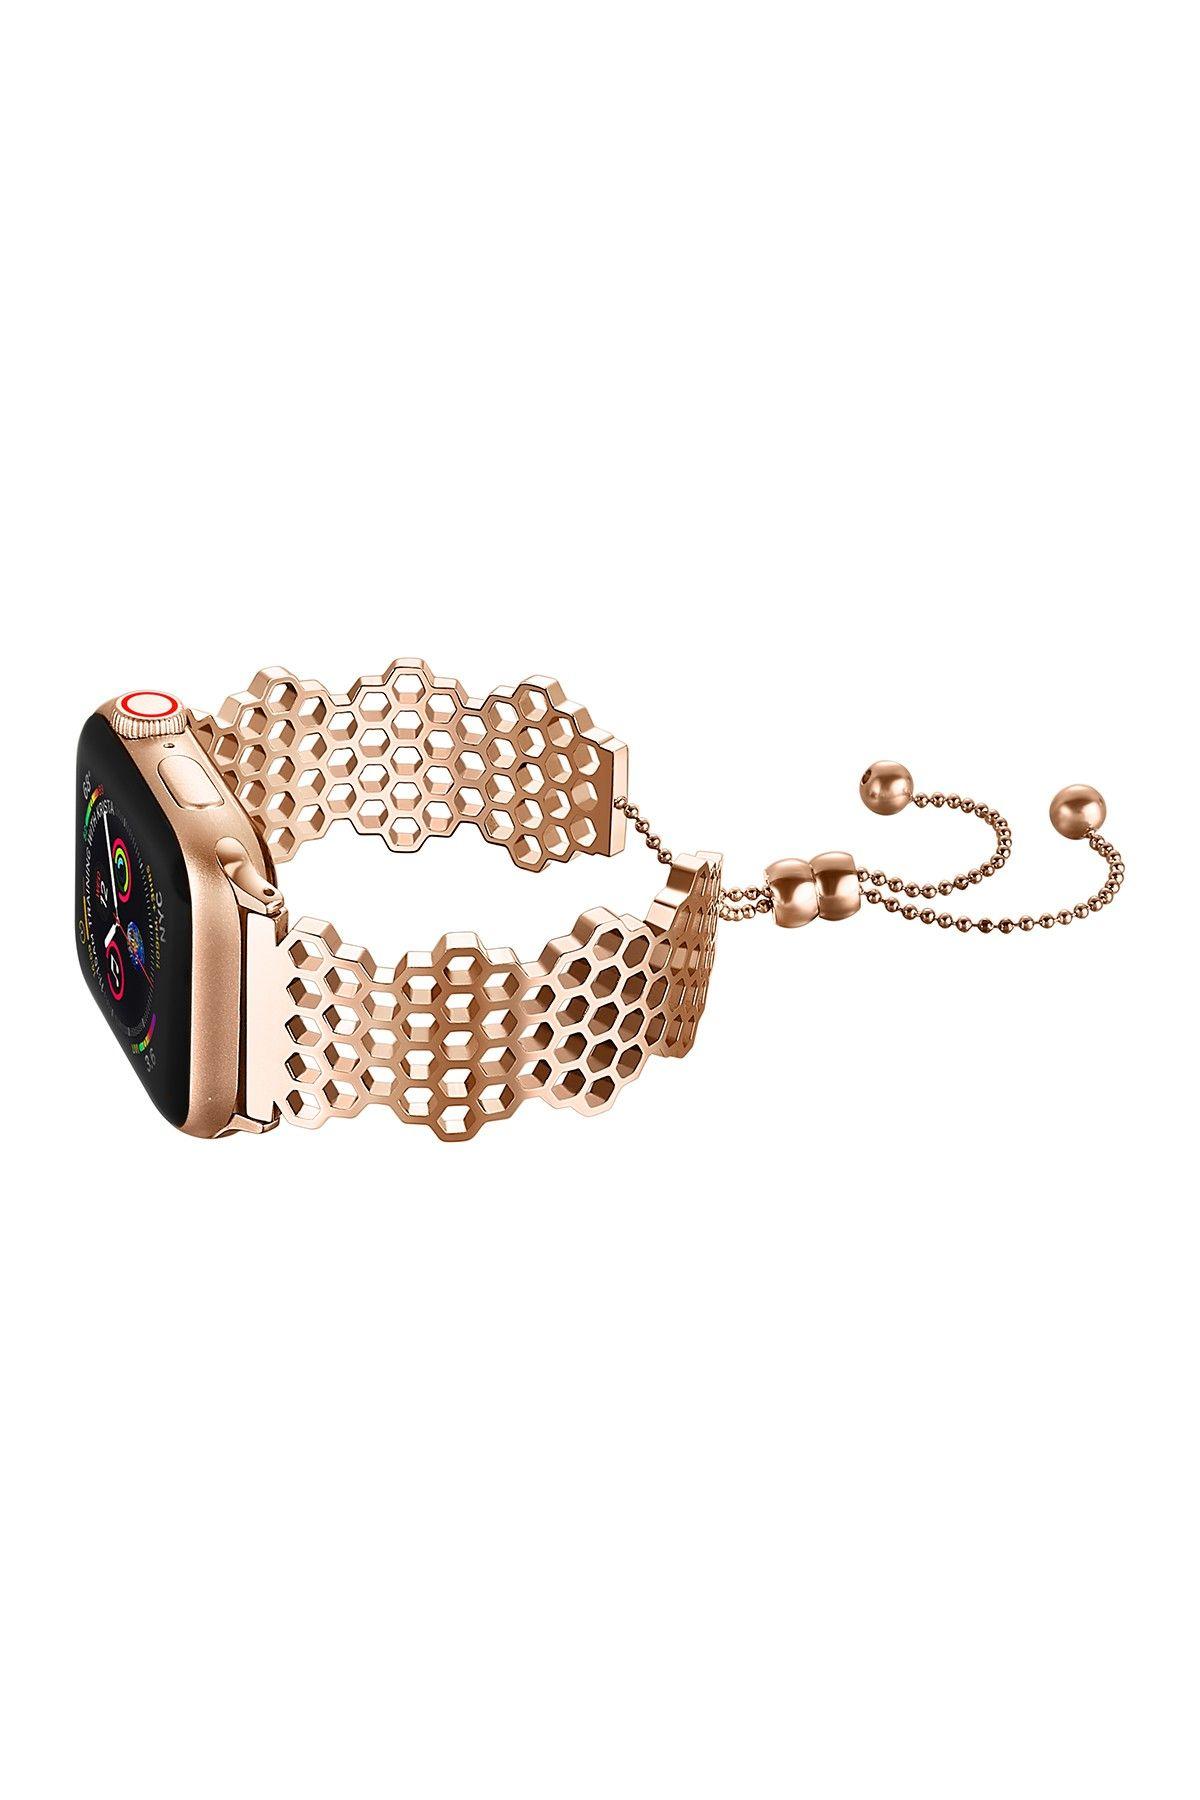 POSH TECH Rose Gold Darling Elegant 38mm Apple Watch 1/2